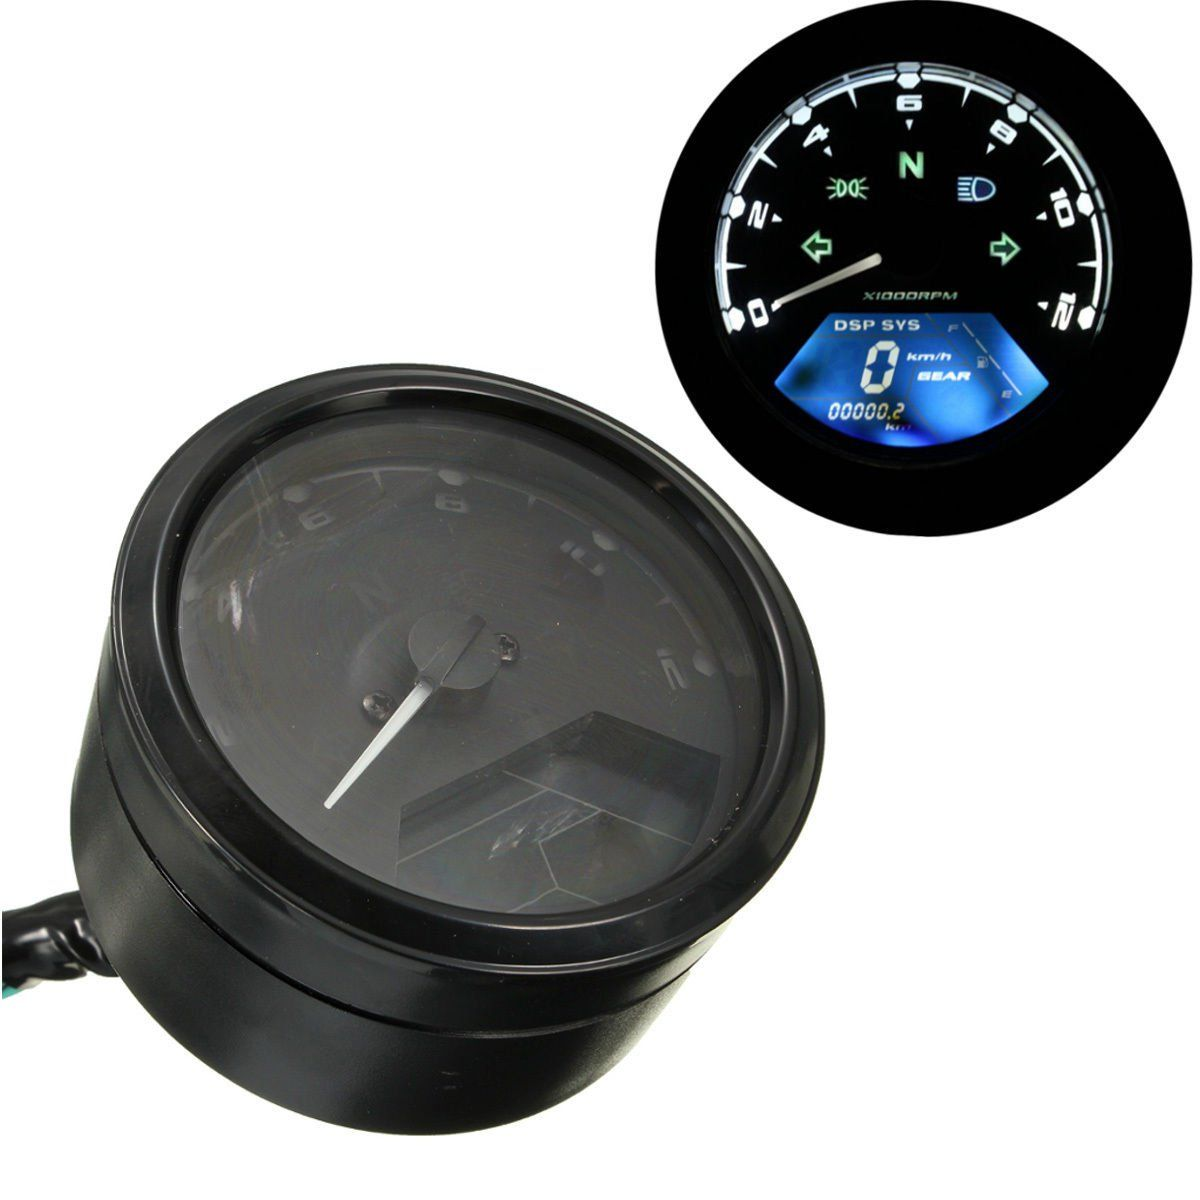 12000RPM+LCD+Digital+Odometer+Speedometer+Tachometer+F1+2+4+Cylinders+Motorcycle+db